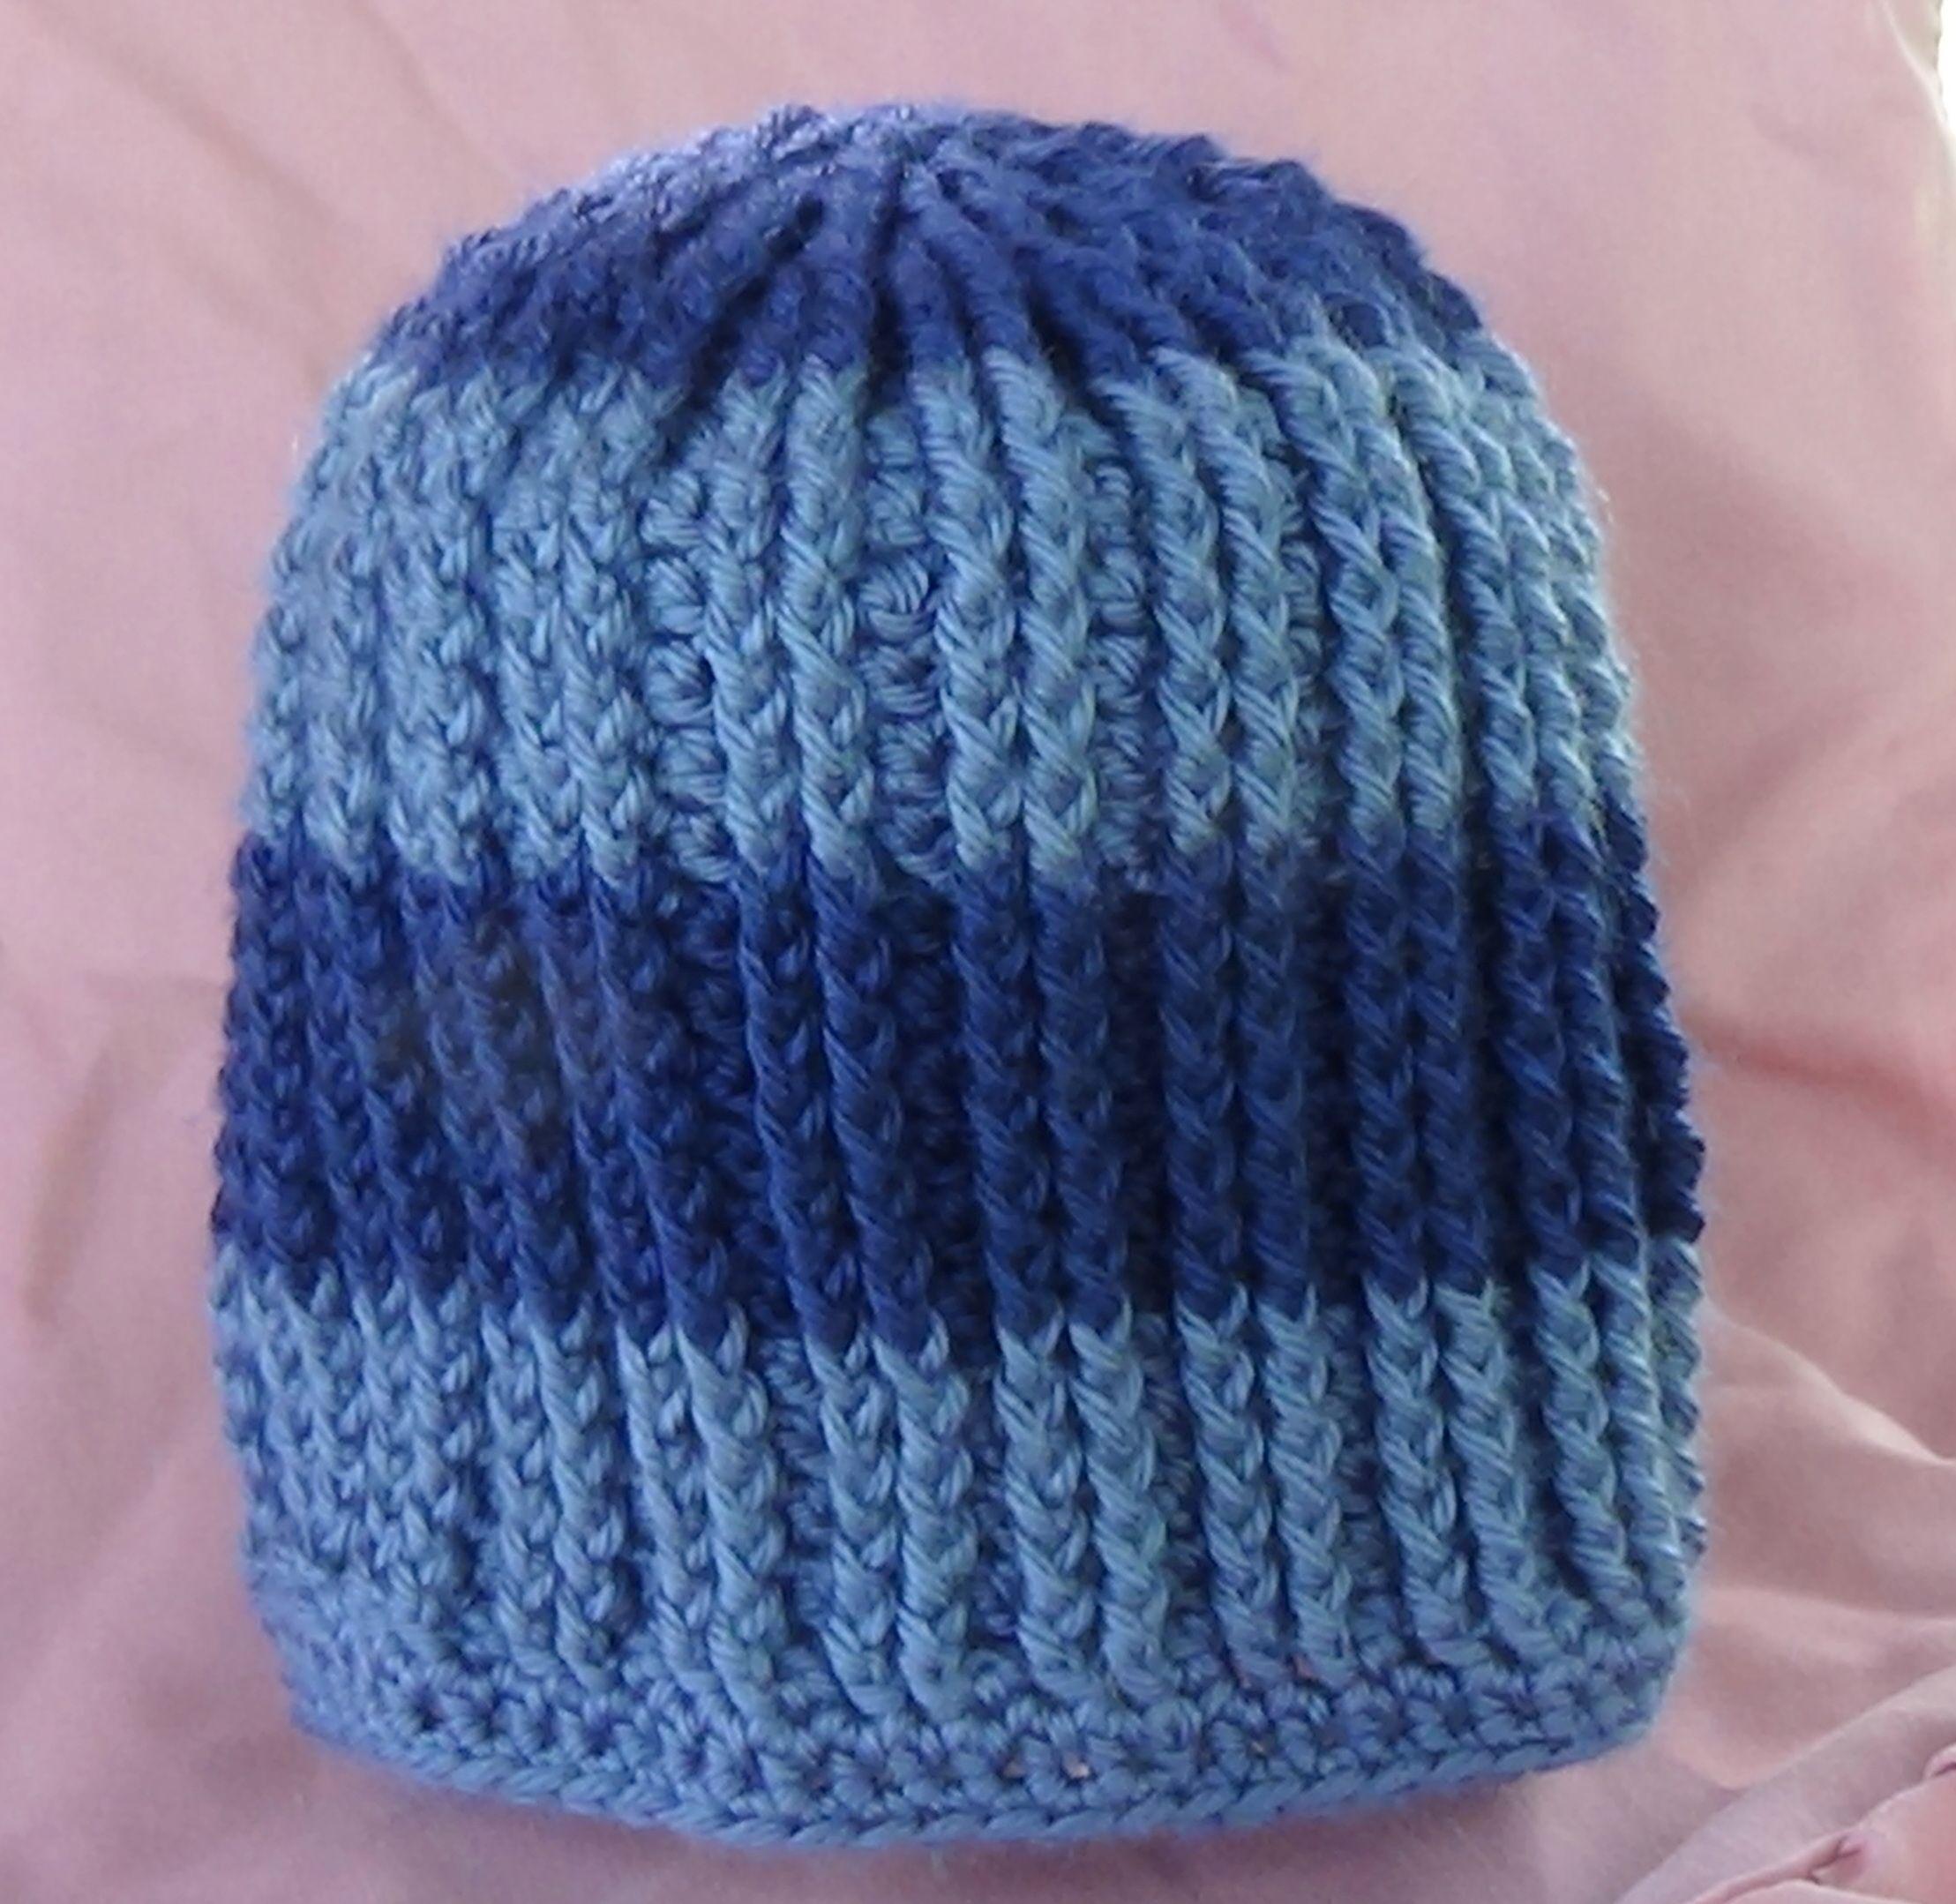 Crochet Beanie Pattern Ribbed : Crochet Ribbed Beanie Crochet awesomeness Pinterest